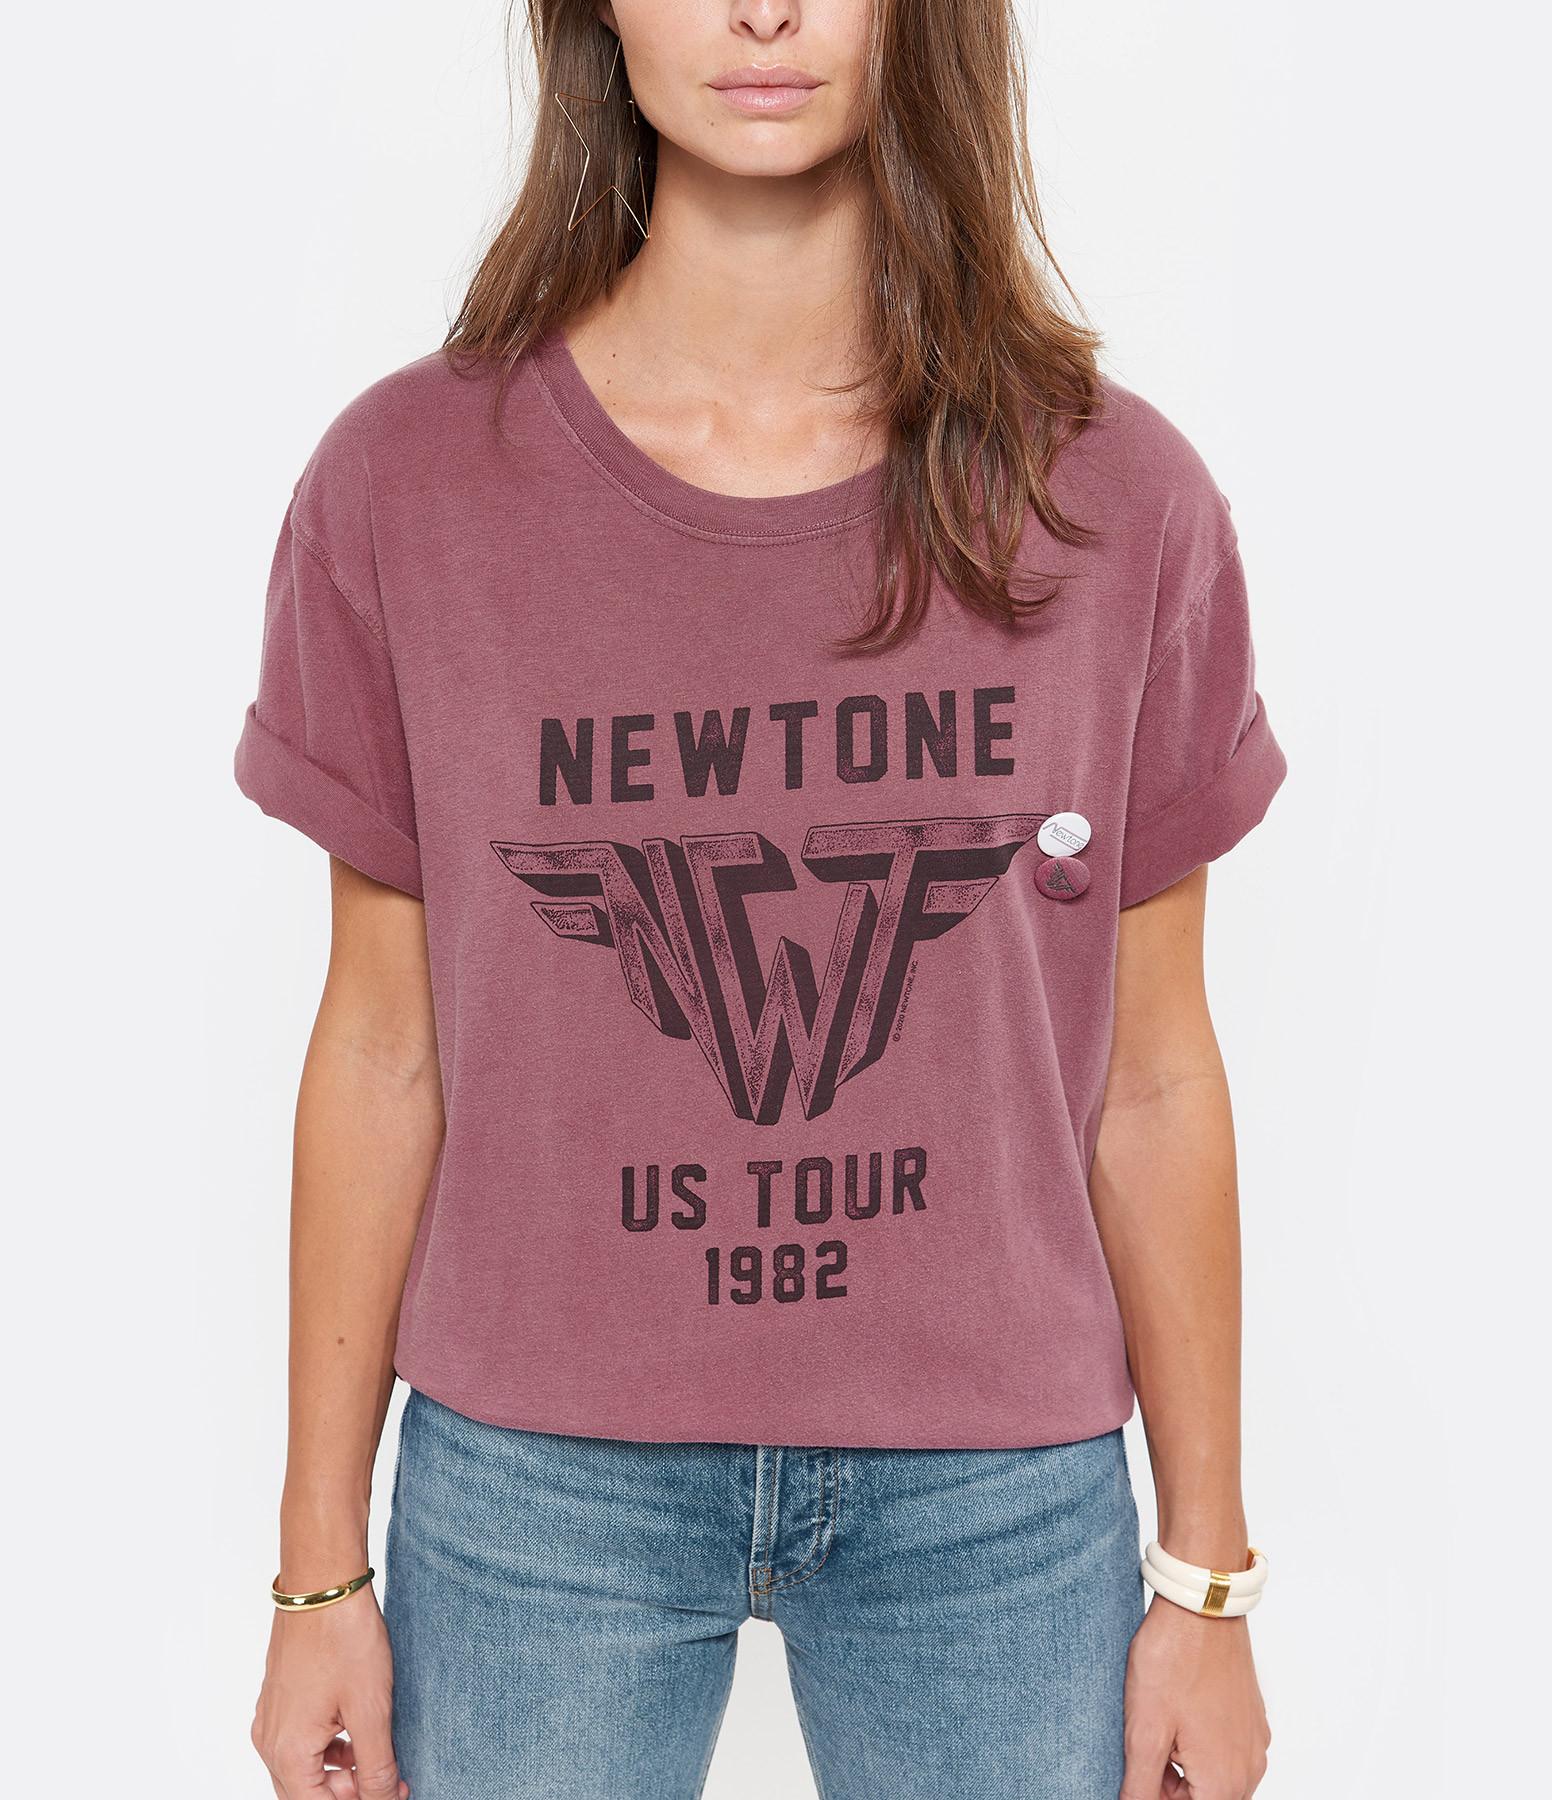 NEWTONE - Tee-shirt Wings Coton Brique